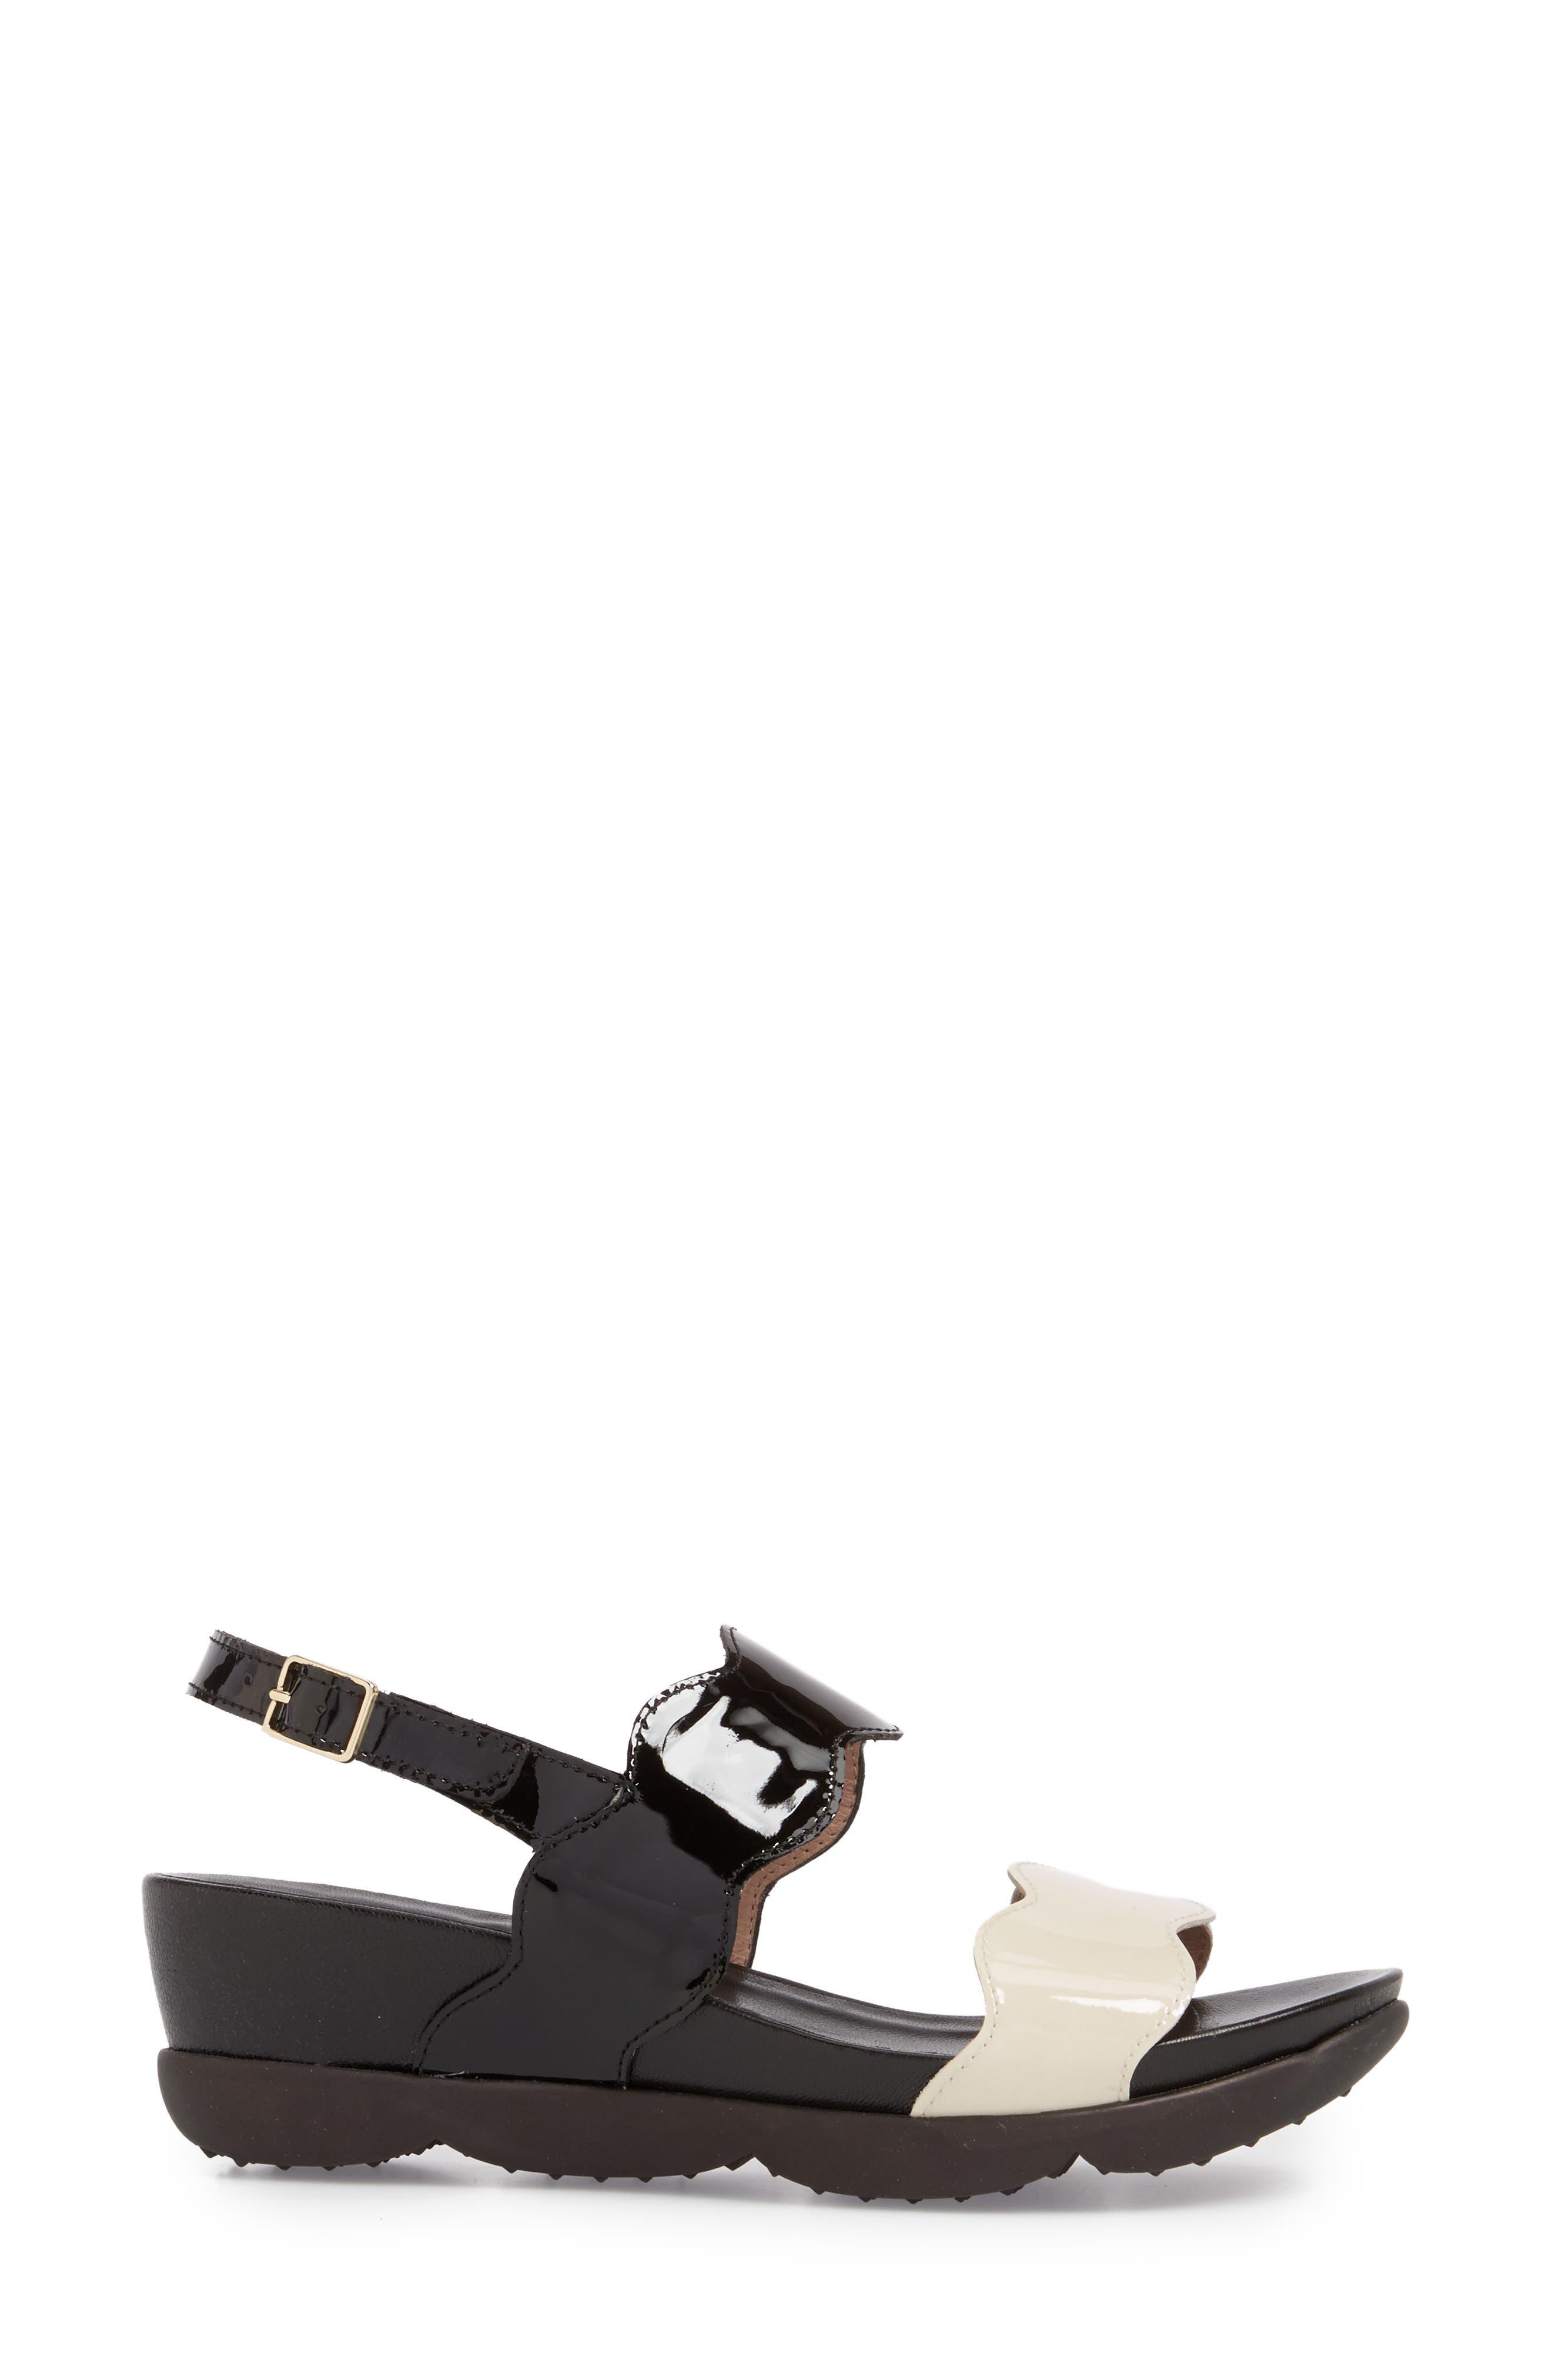 Wedge Sandal,                             Alternate thumbnail 3, color,                             BLACK/ OFF LEATHER